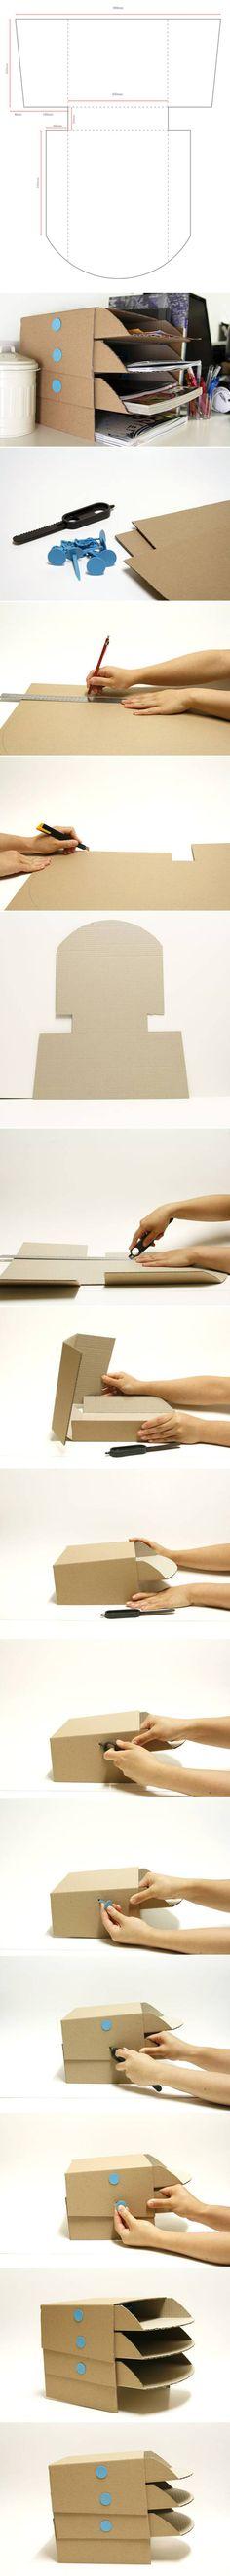 Diy Projects: Cardboard Desk Tray